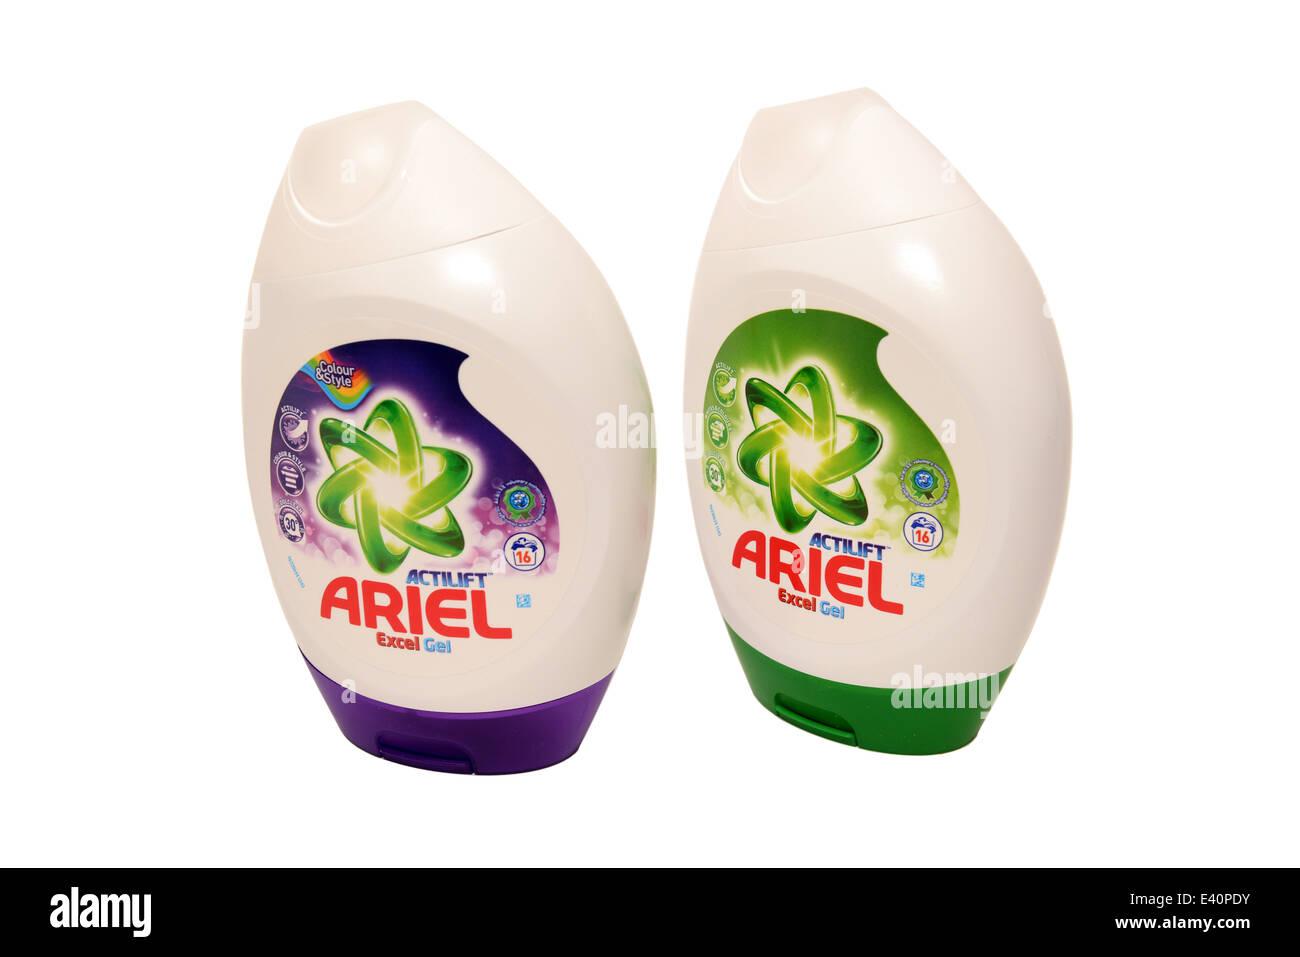 Ariel Laundry Detergent  P&G - Stock Image